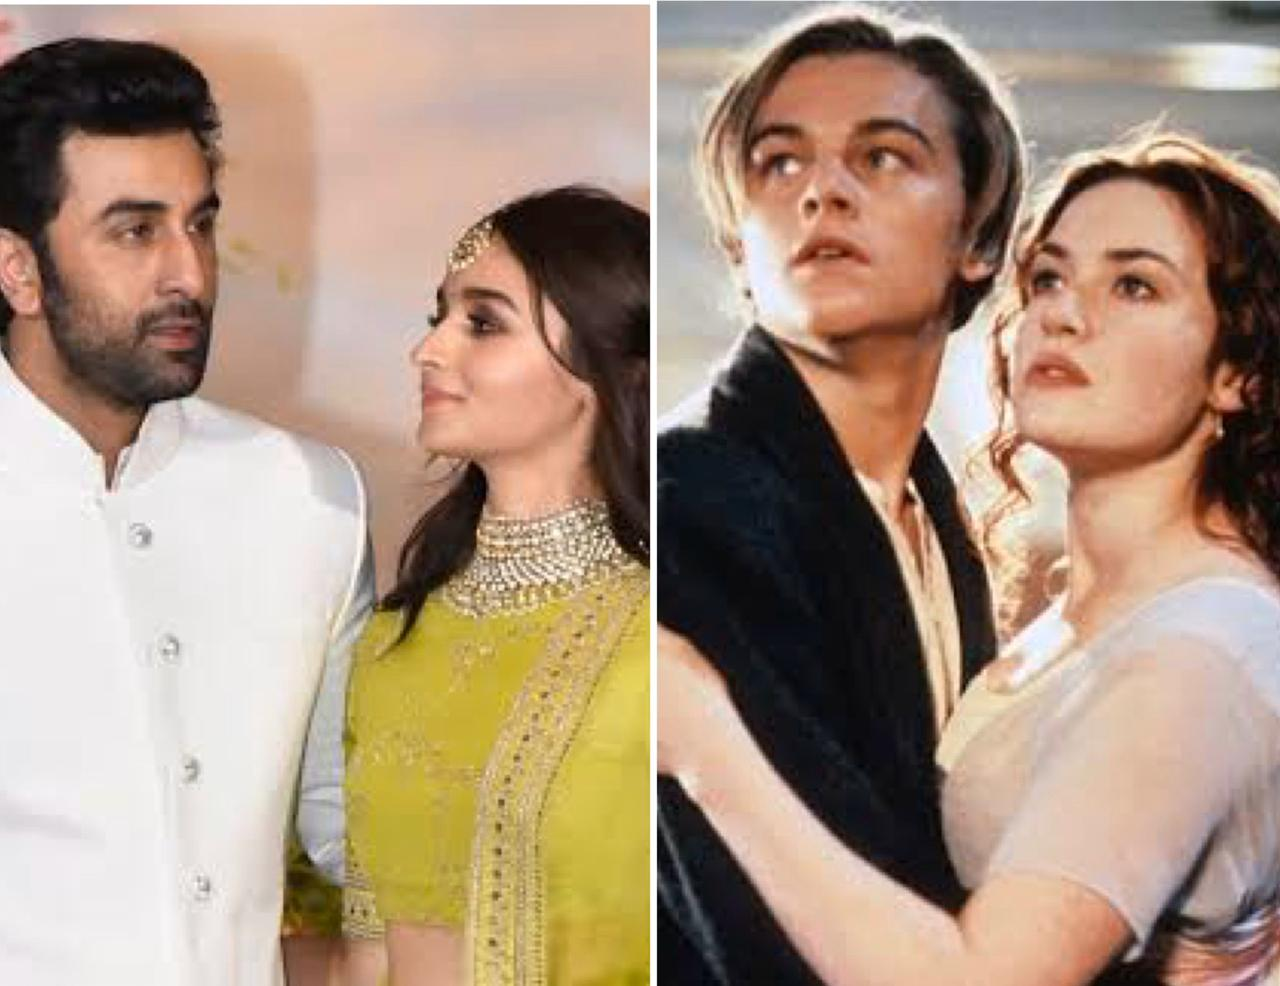 ranbir kapoor alia bhatt perfect for titanic hindi remake says film maker